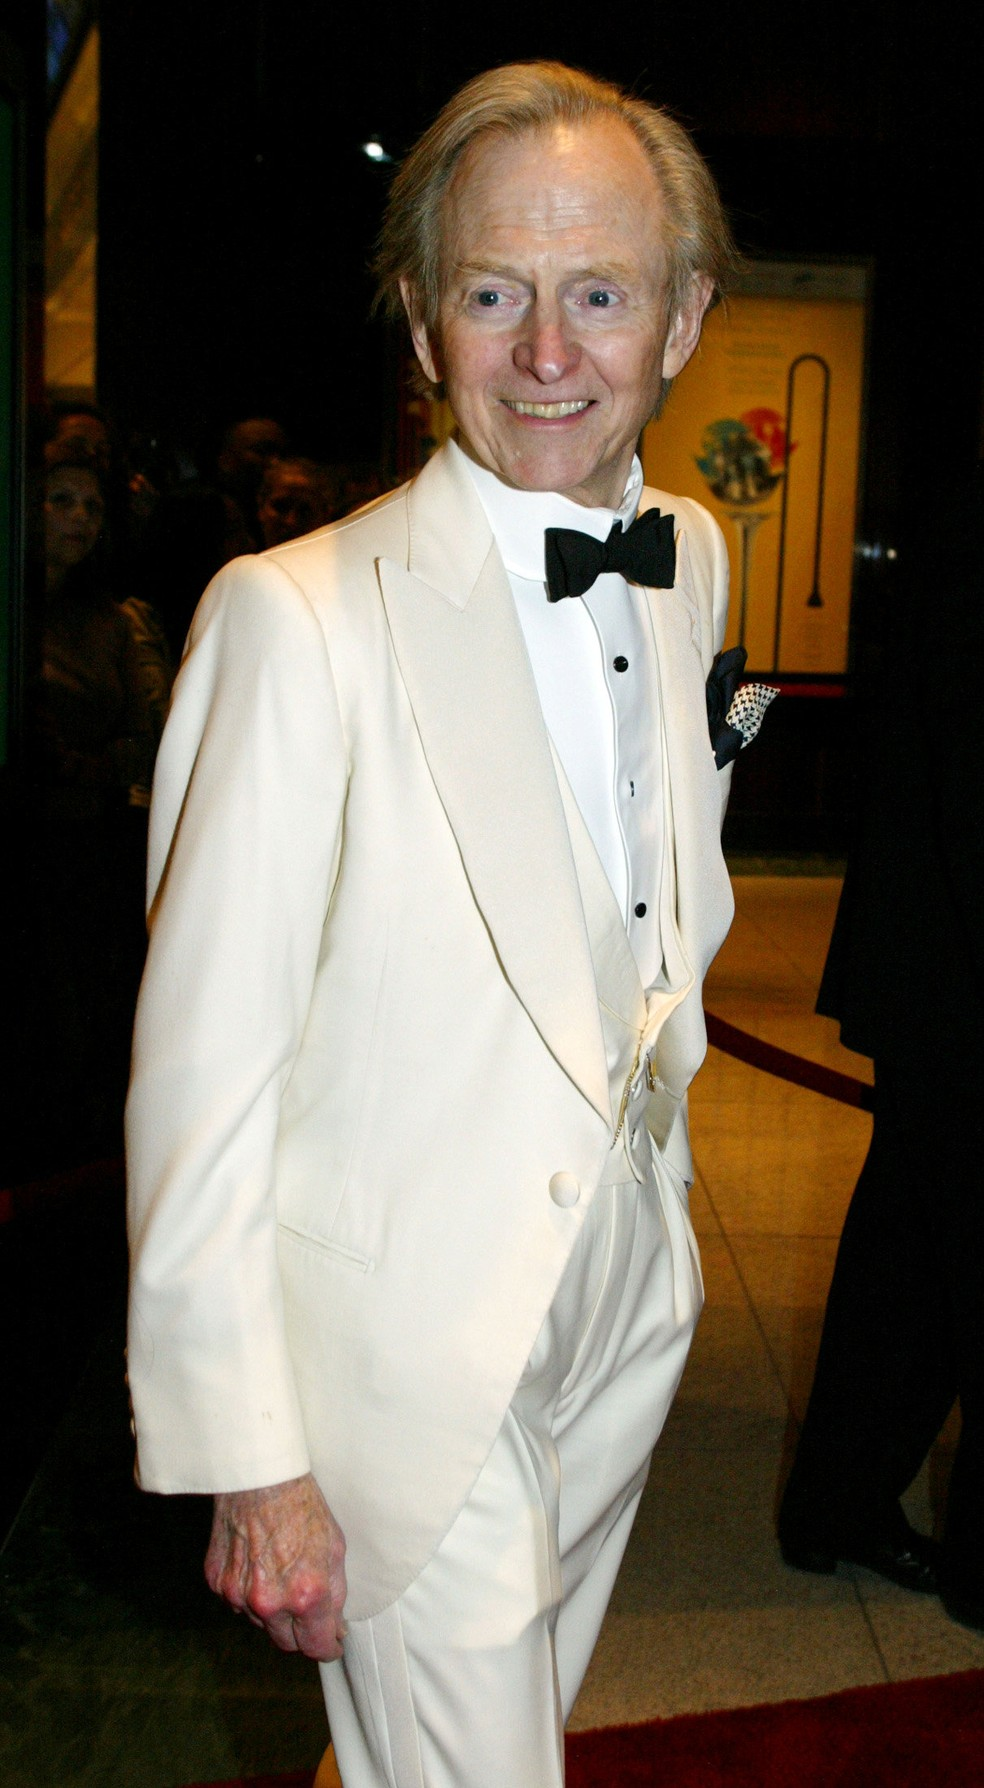 Tom Wolfe em 2005 (Foto: Reuters/Jeff Christensen/Arquivo)